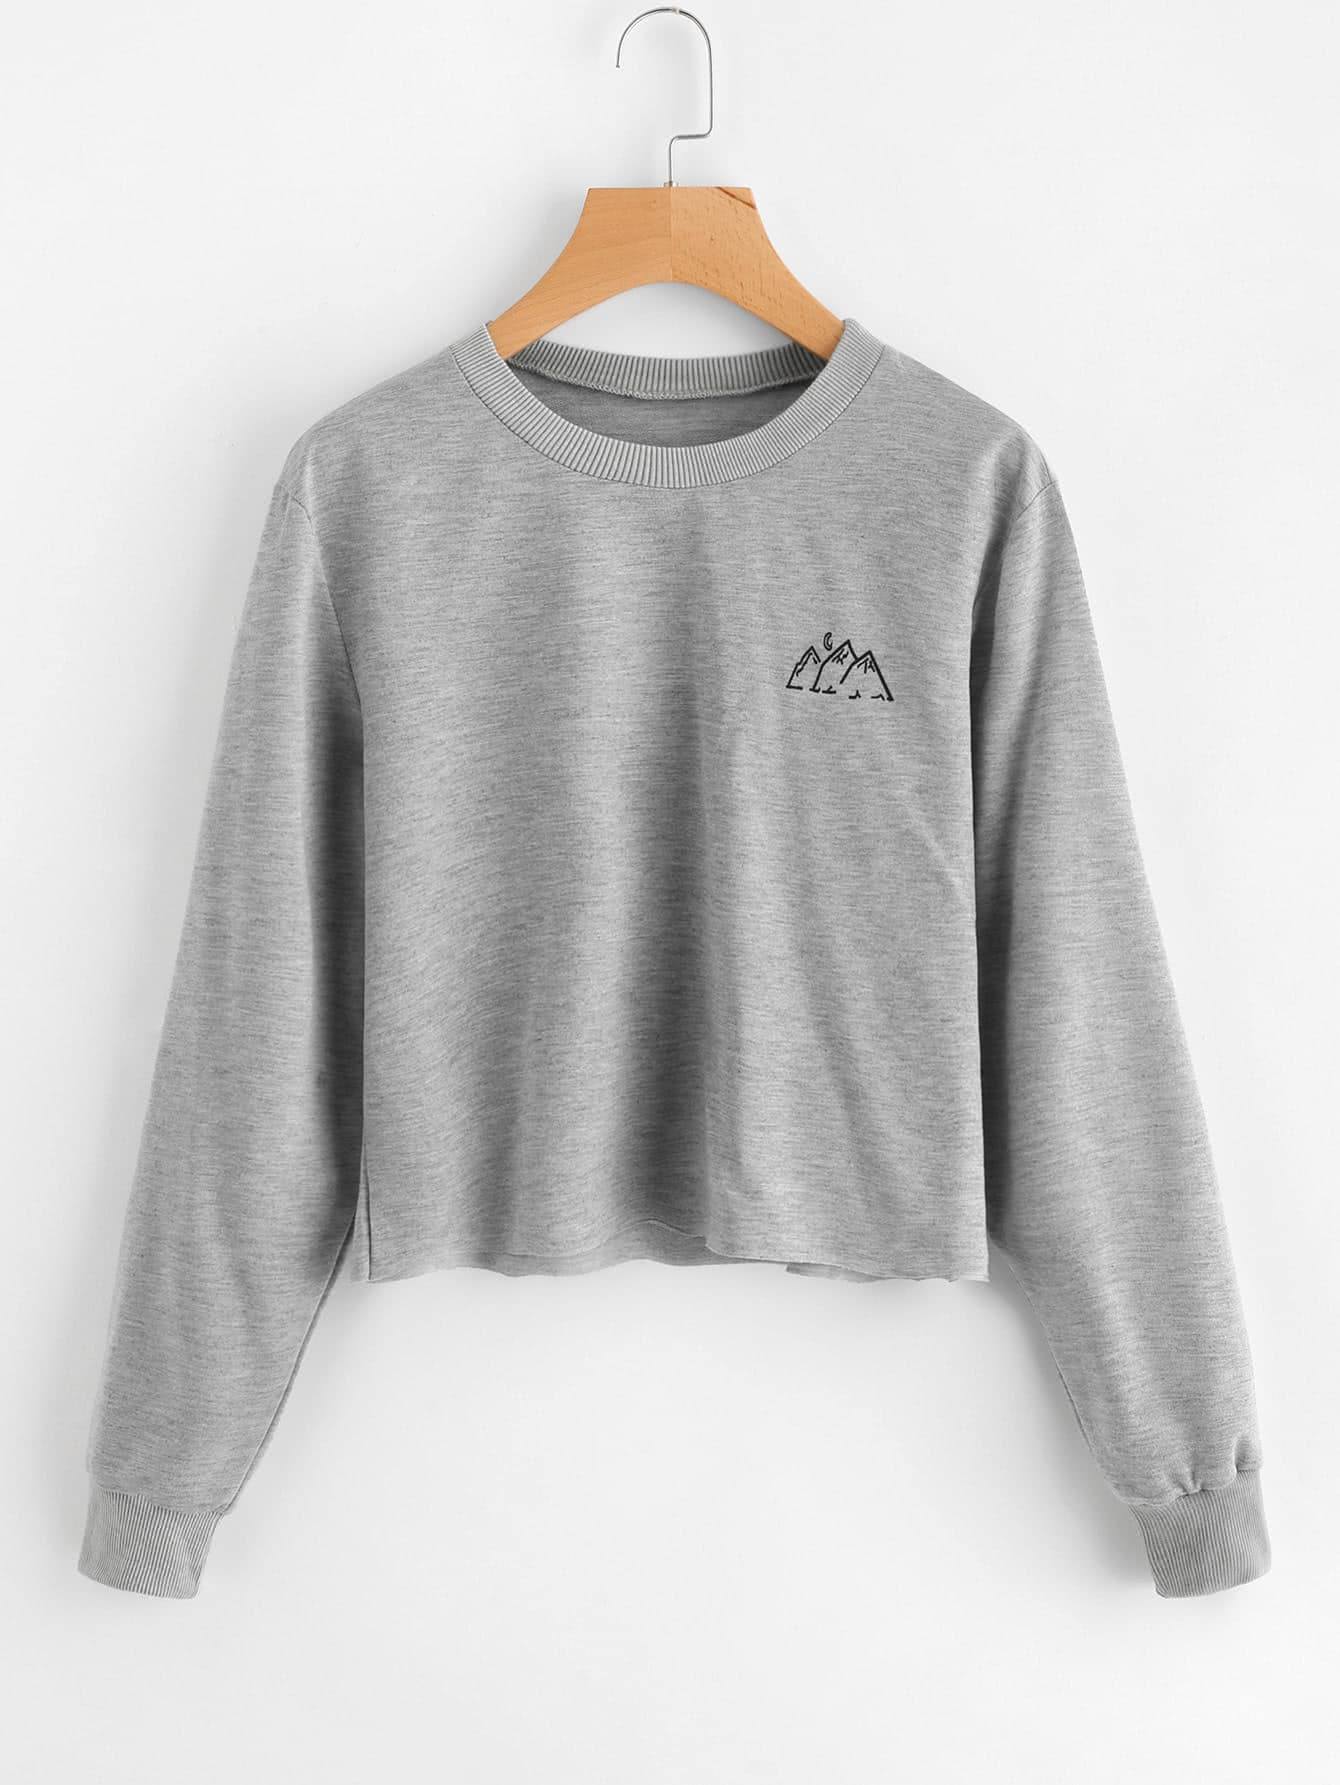 Graphic Print Sweatshirt graphic print fit